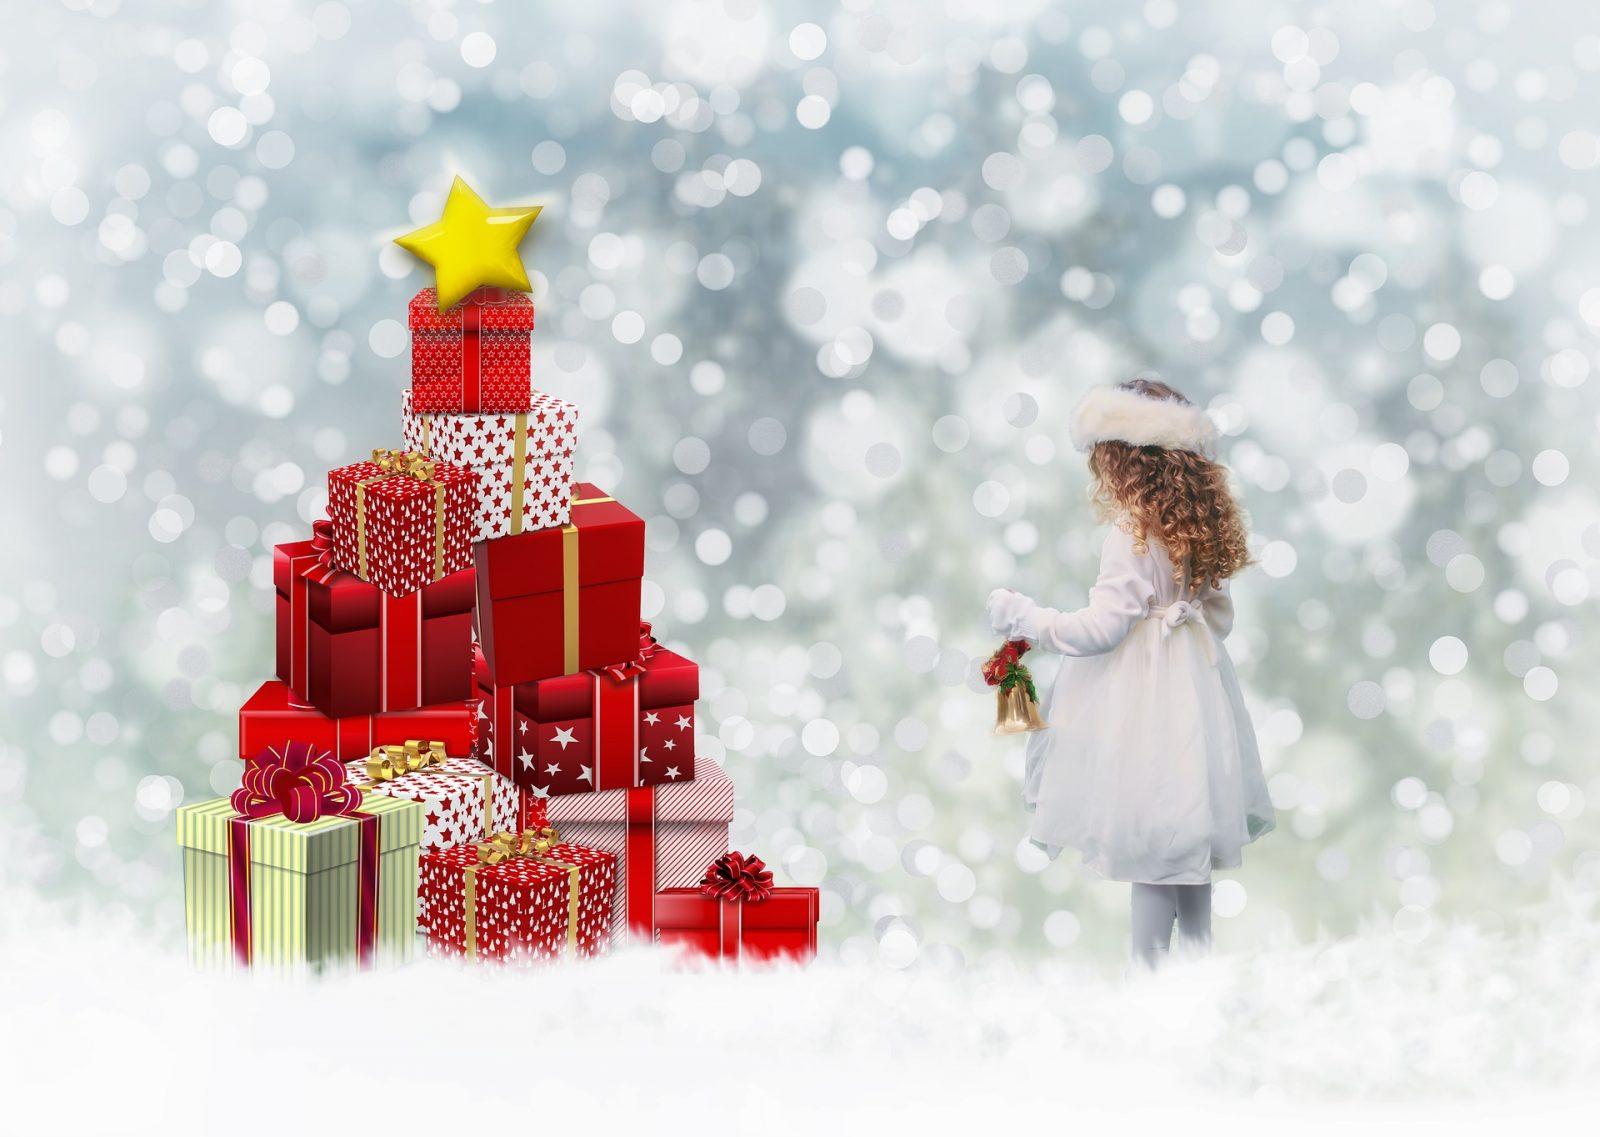 MWB The Magic of Christmas